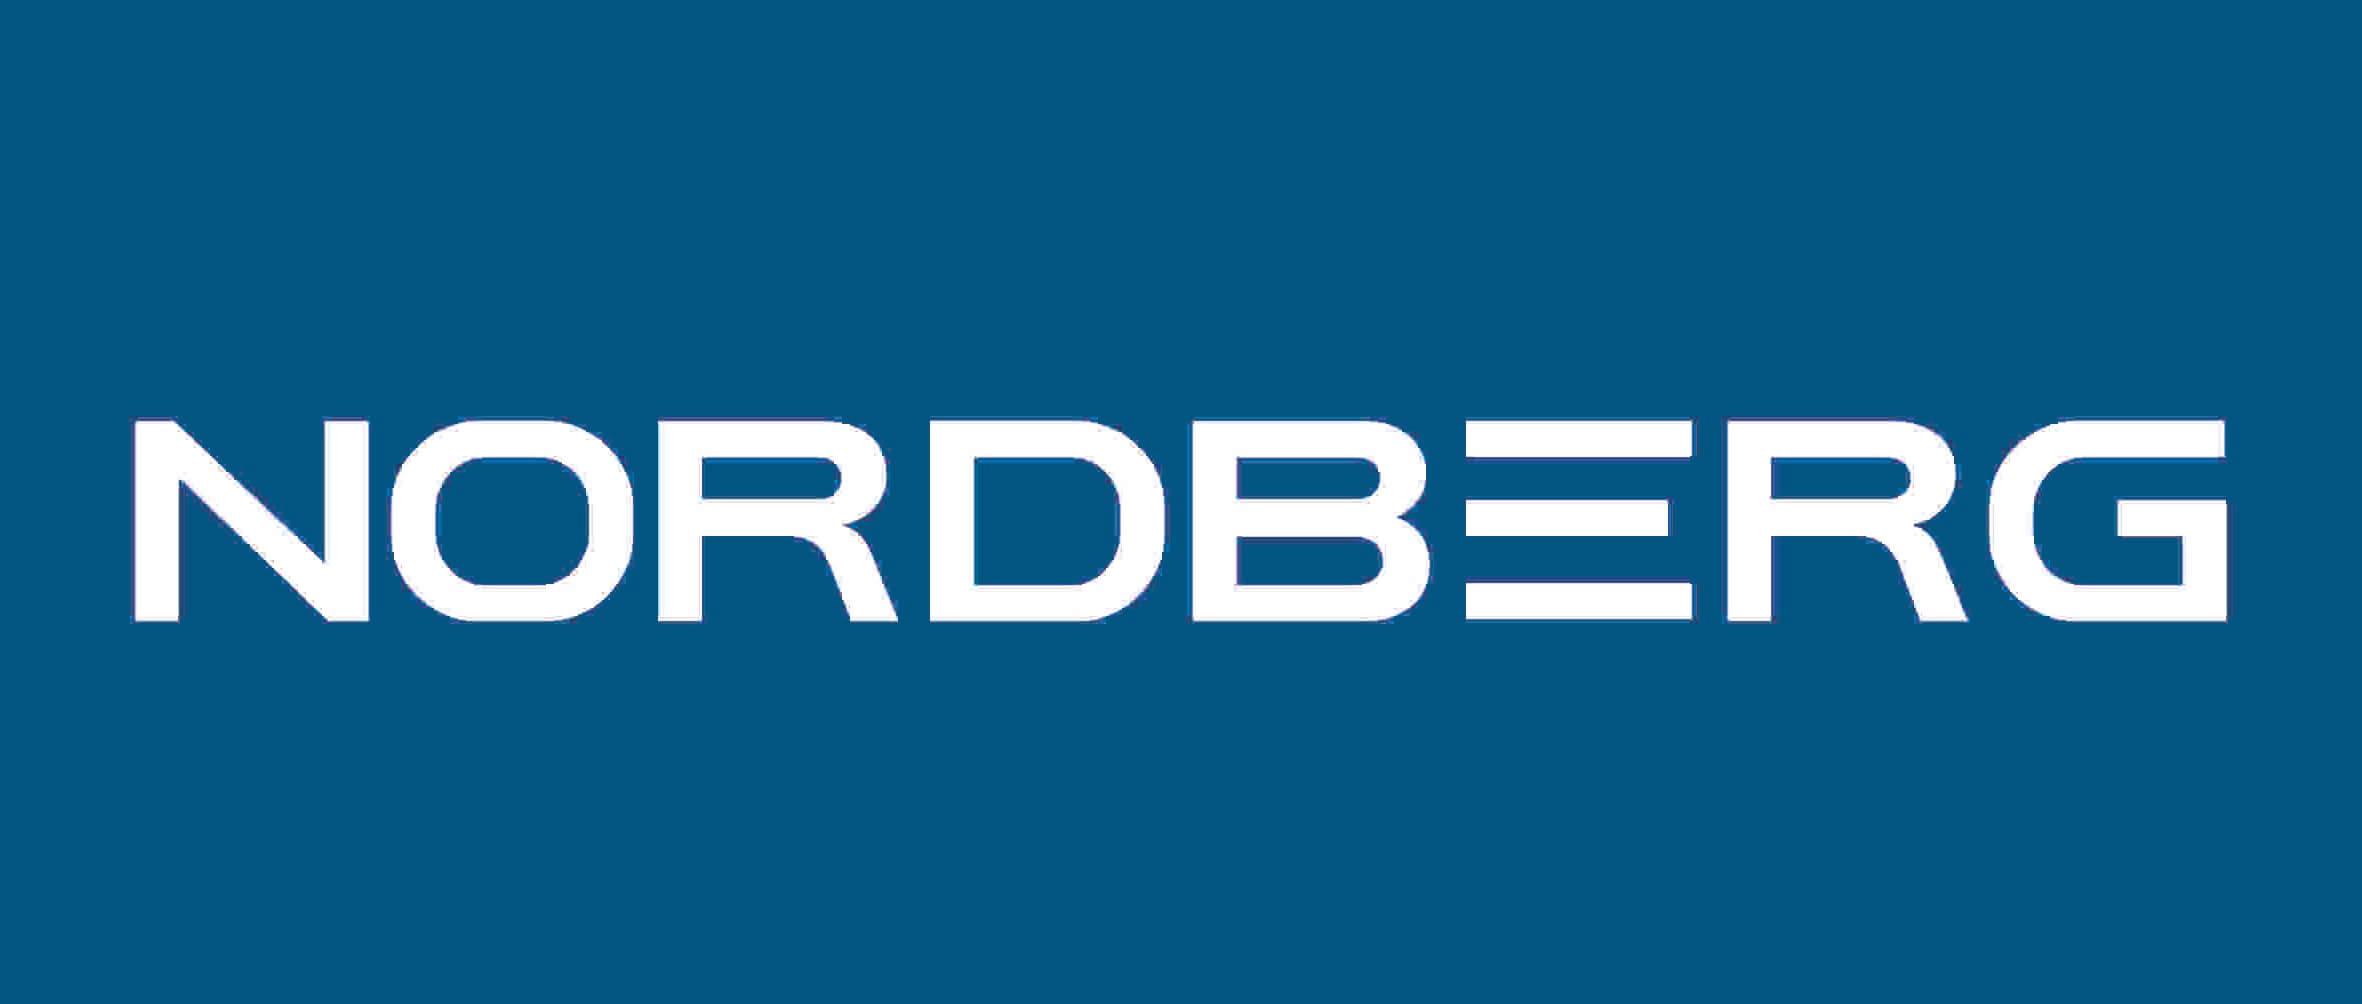 NORDBERG / Нордберг